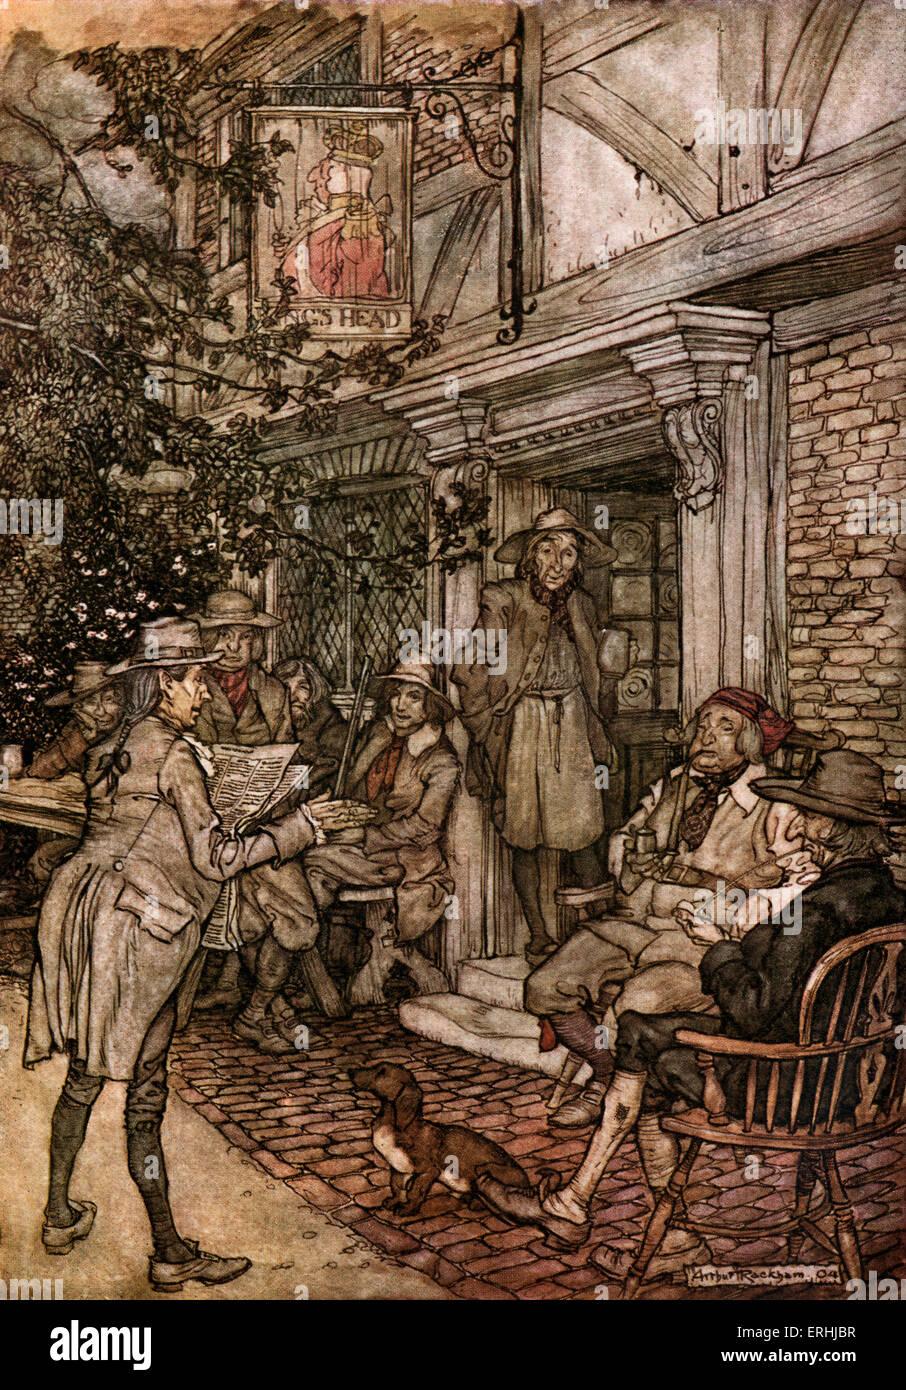 Washington Irving 's short story 'Rip van Winkle' - Illustration by Arthur Rackham, 1904. 'He used - Stock Image